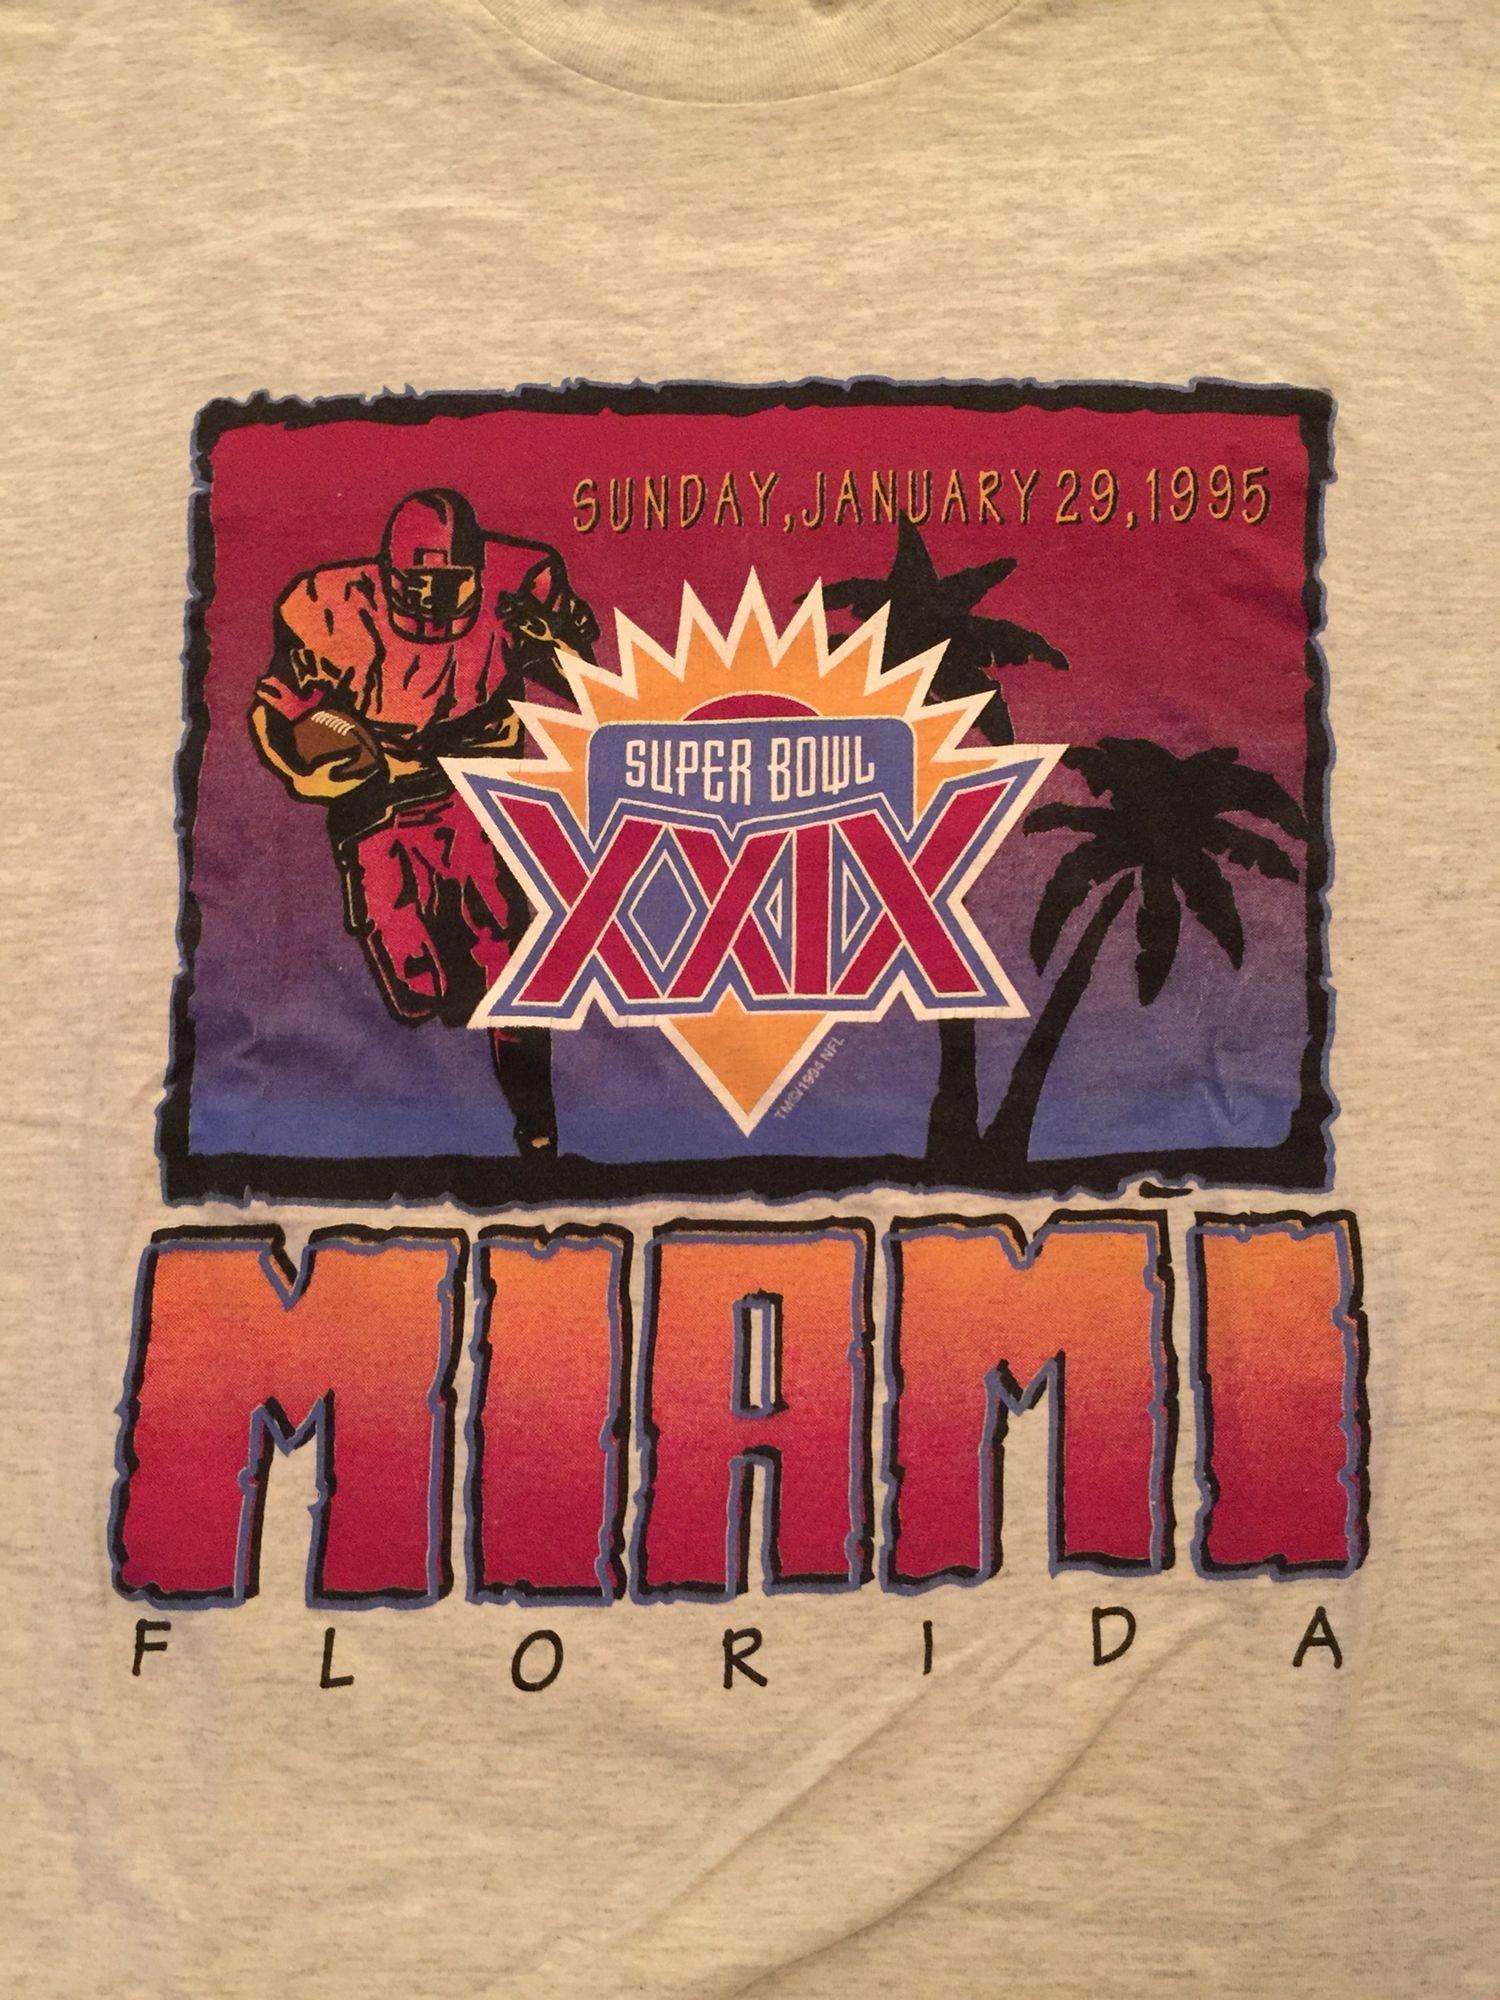 Super Bowl Xxix-Miami   Super Bowl, Special Events, Vintage with regard to Miami Super Bowl Activities